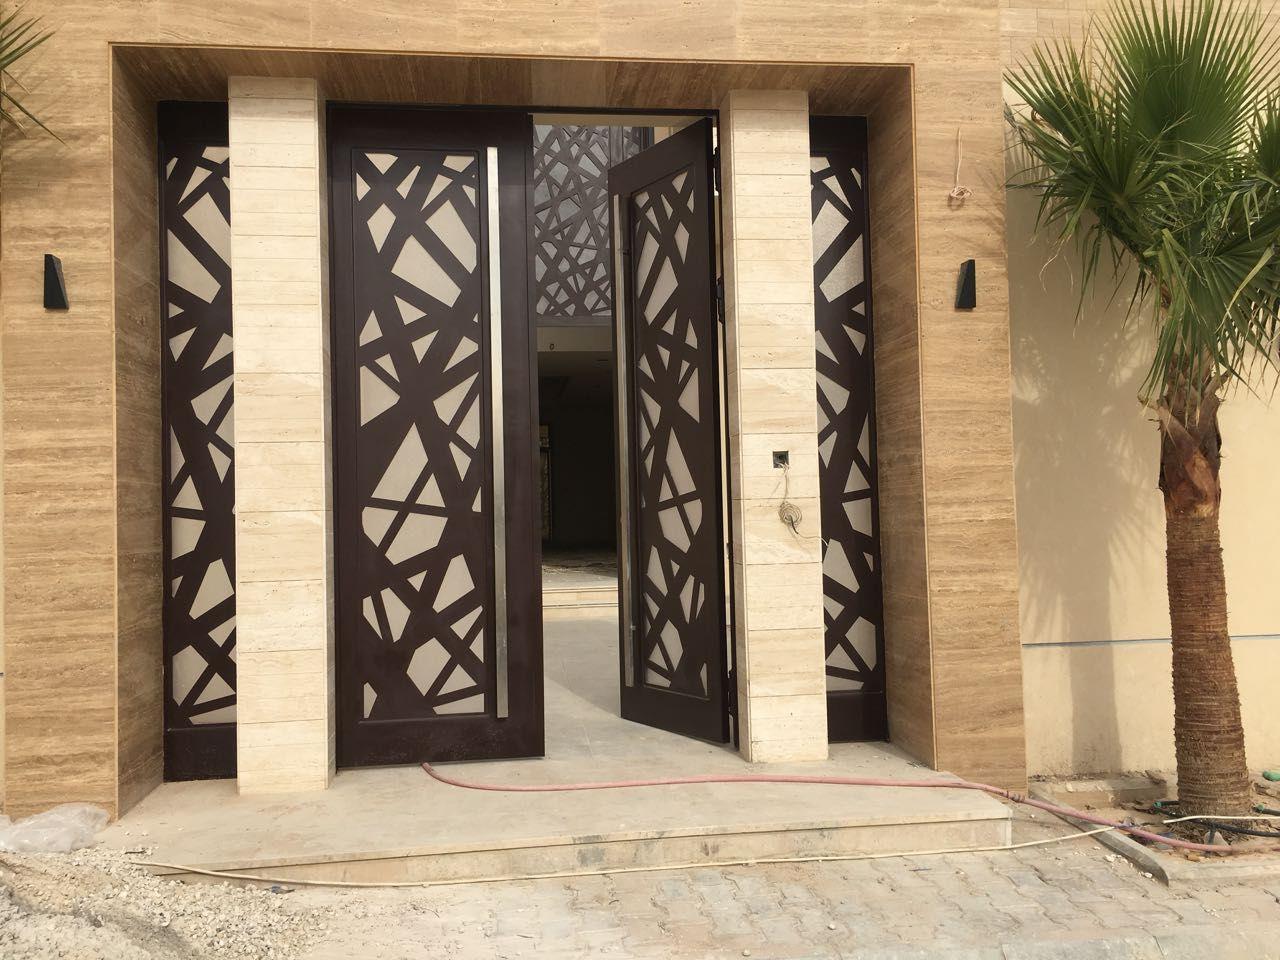 Puertas de exterior puertas exterior modernas puertas for Puertas decorativas para interiores